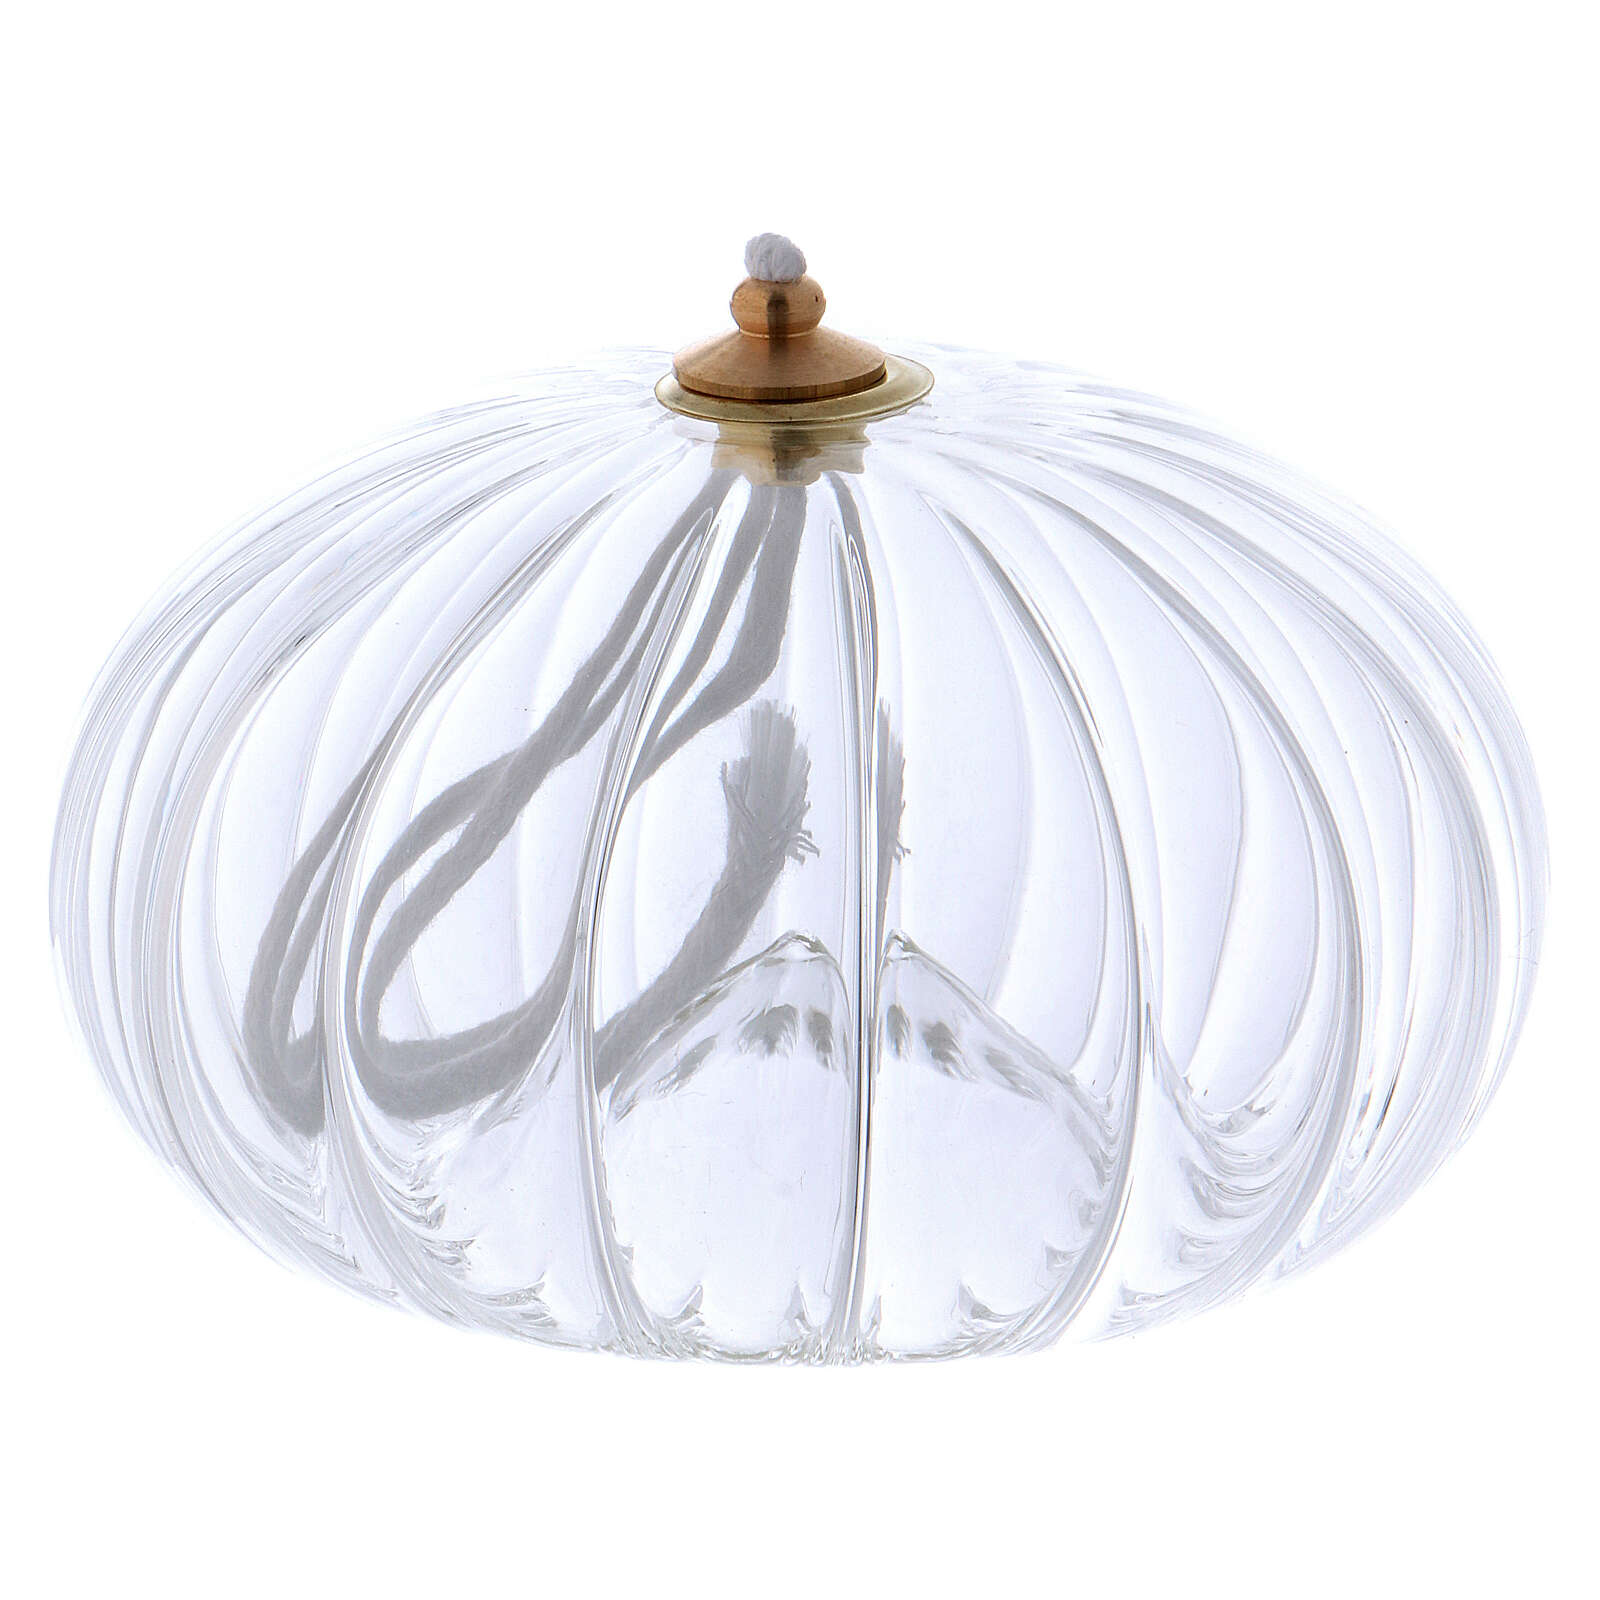 Altarlampe, als Öllampe ausgeführt, Granatapfel-Form 3